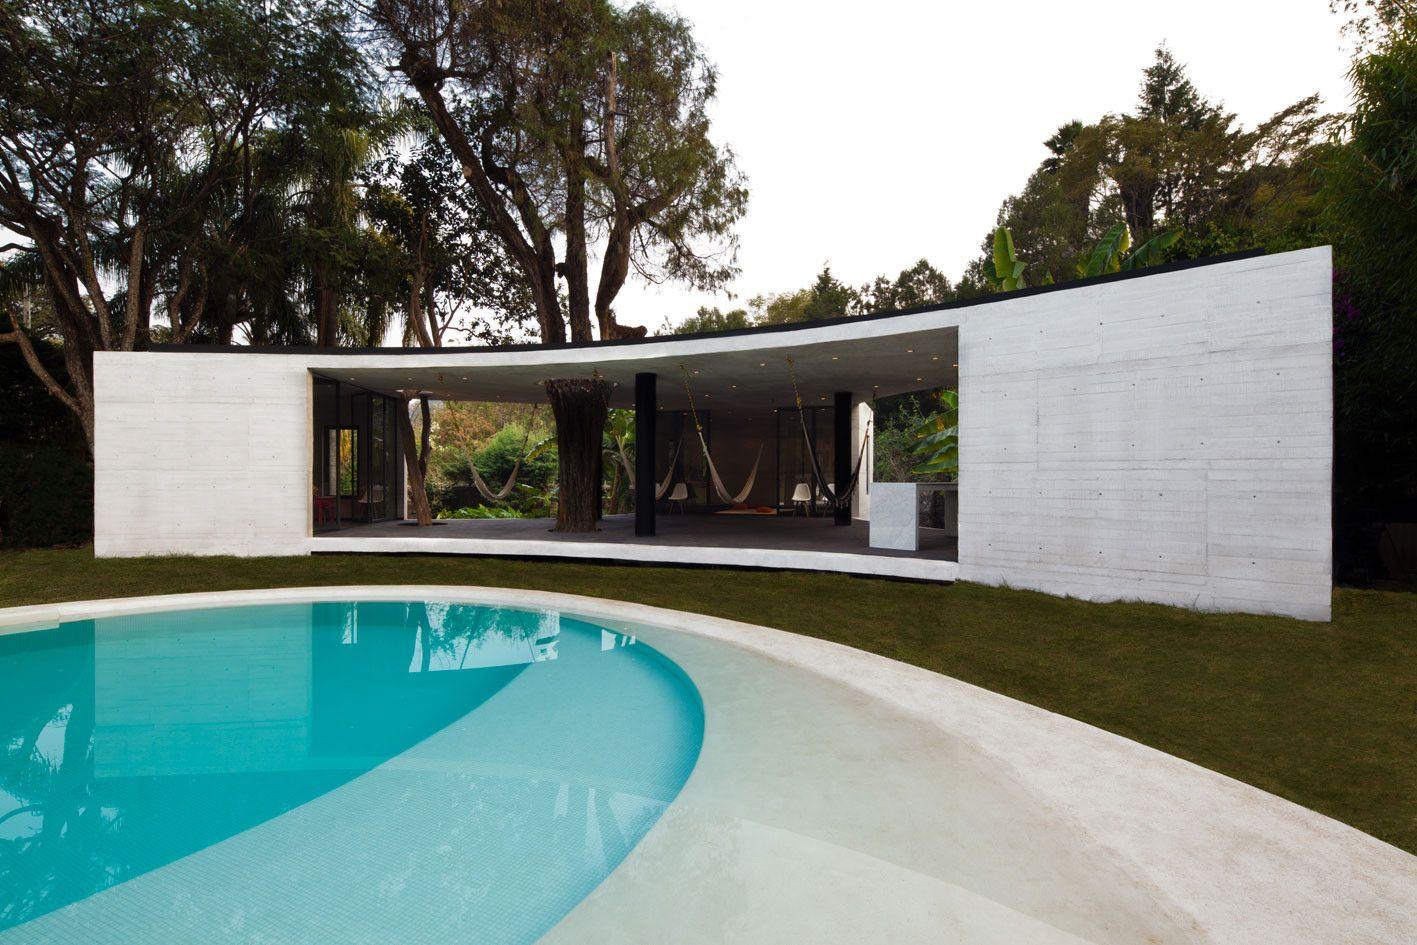 Tepoztlan Lounge by Cadaval & Solà-Morales